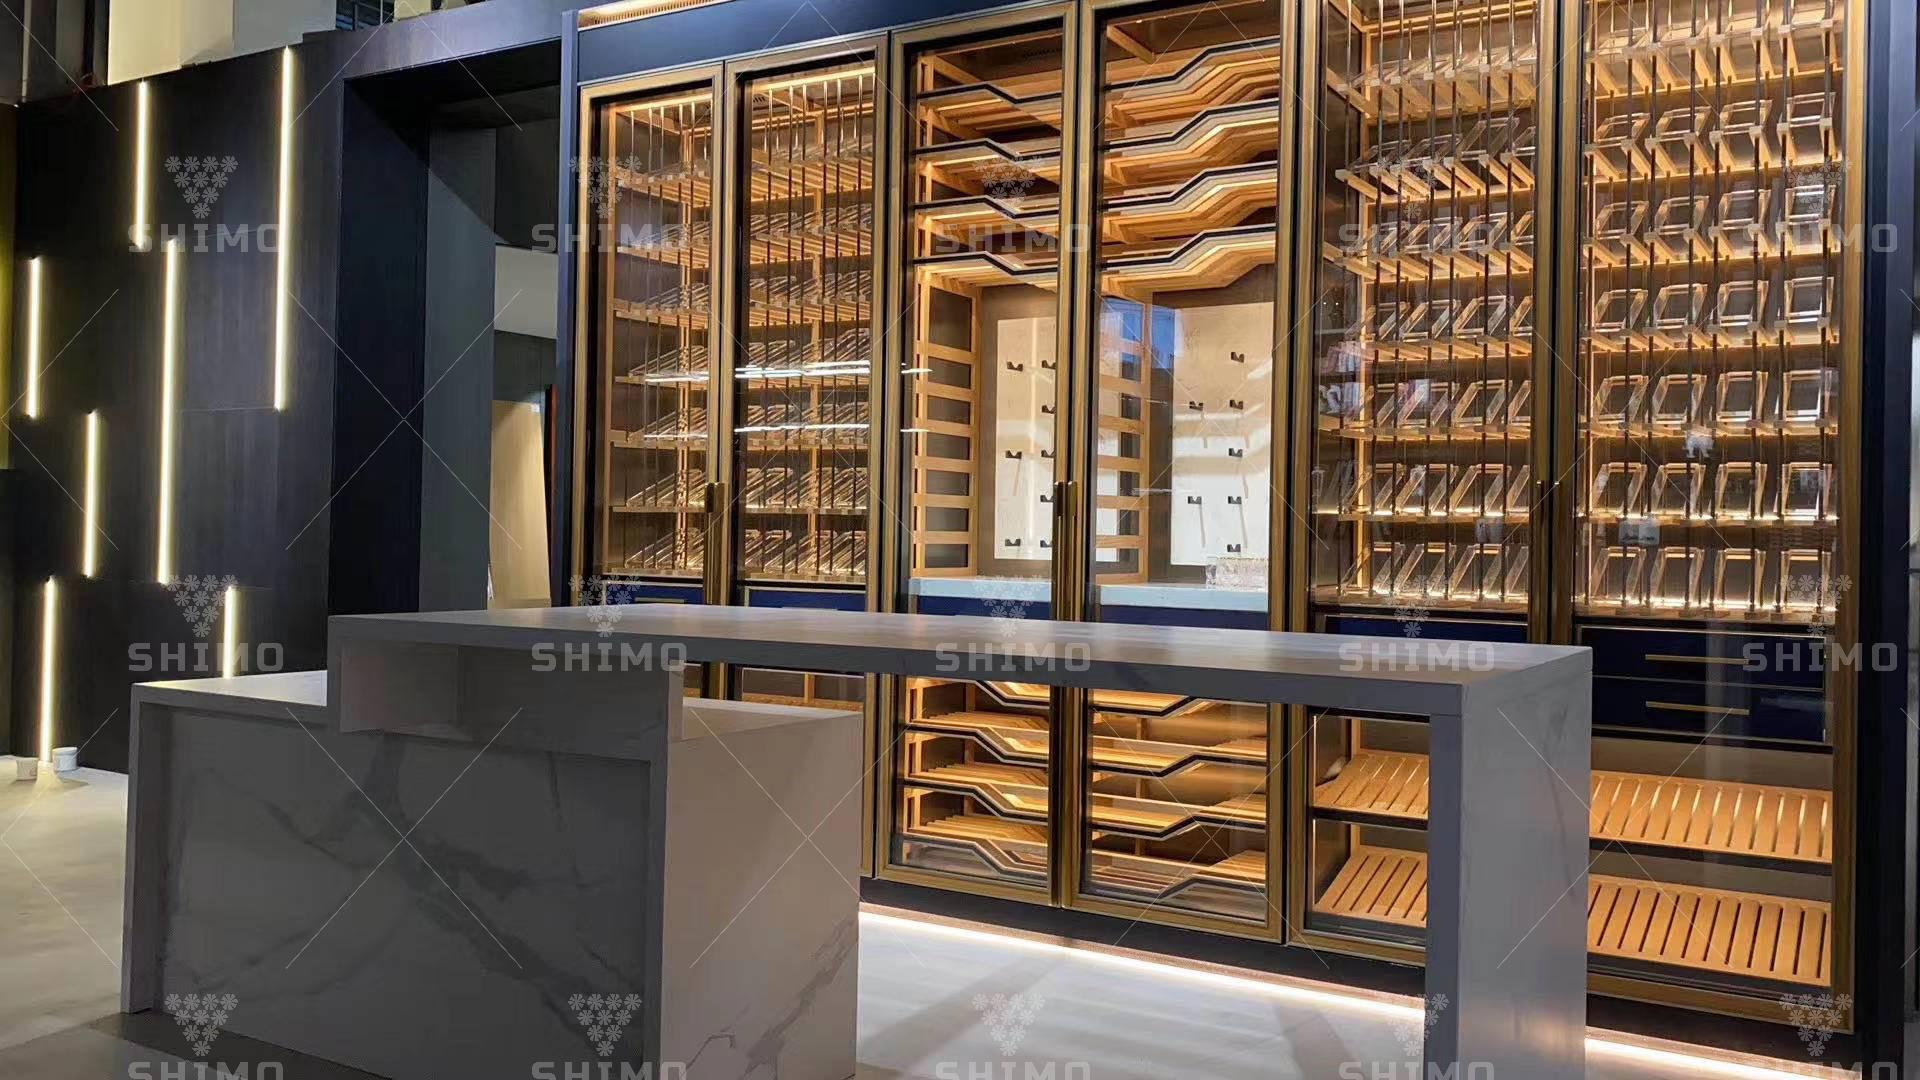 shimo-wine-coolers-vinnye-shkafy-073